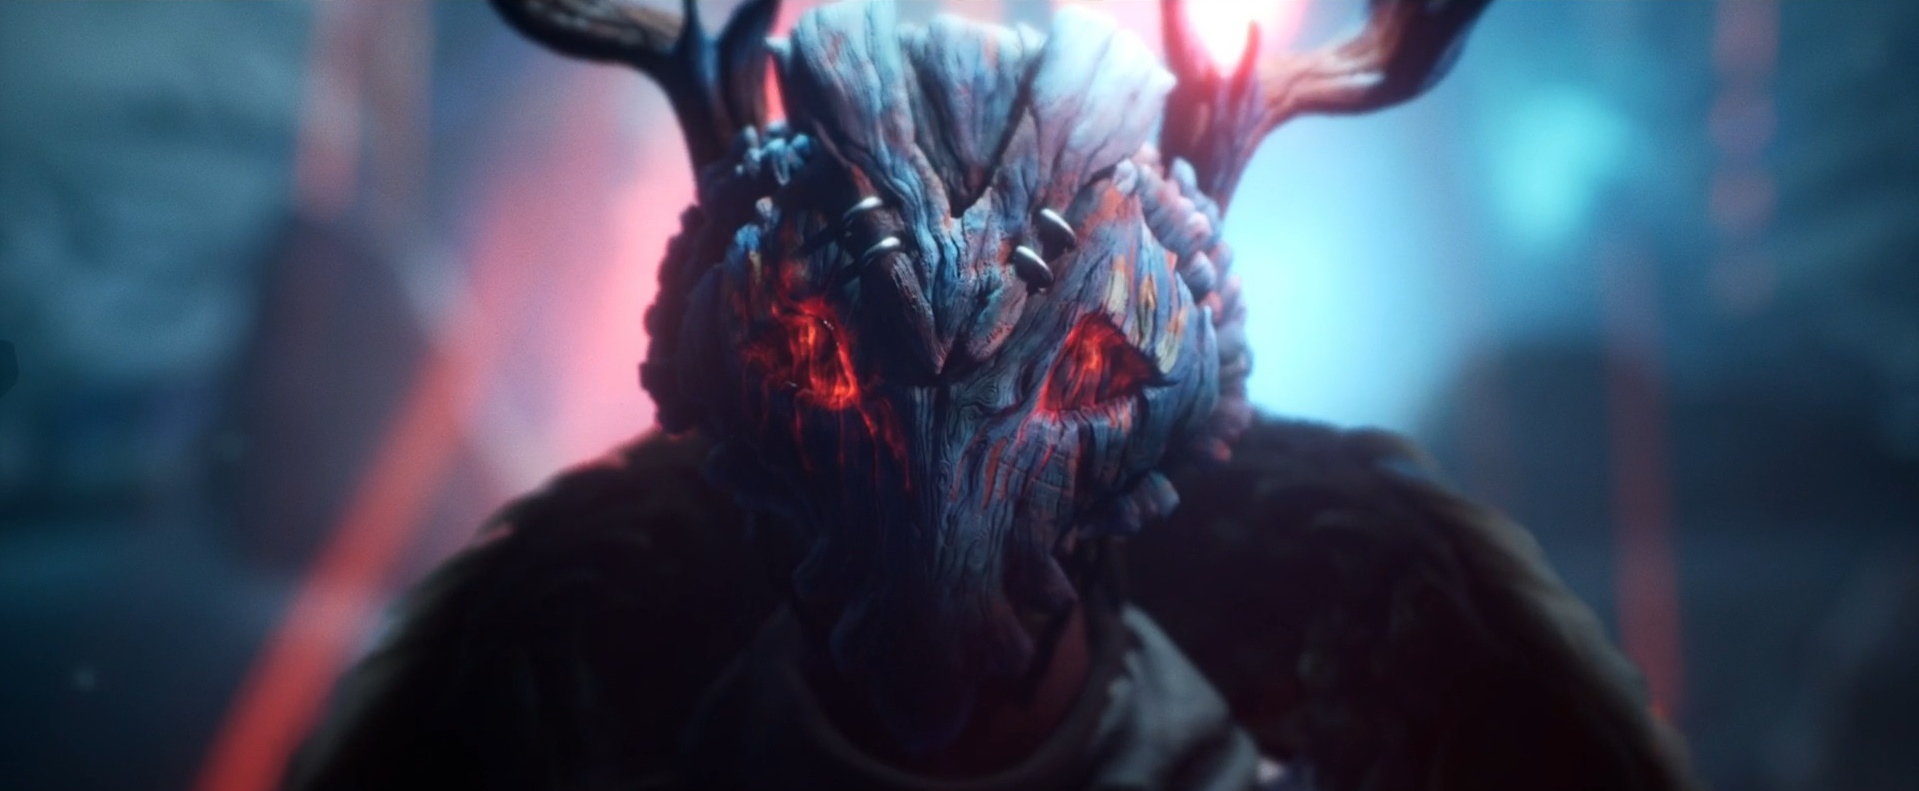 Kena: Bridge of Spirits бесплатно обновят с PS4 на PS5